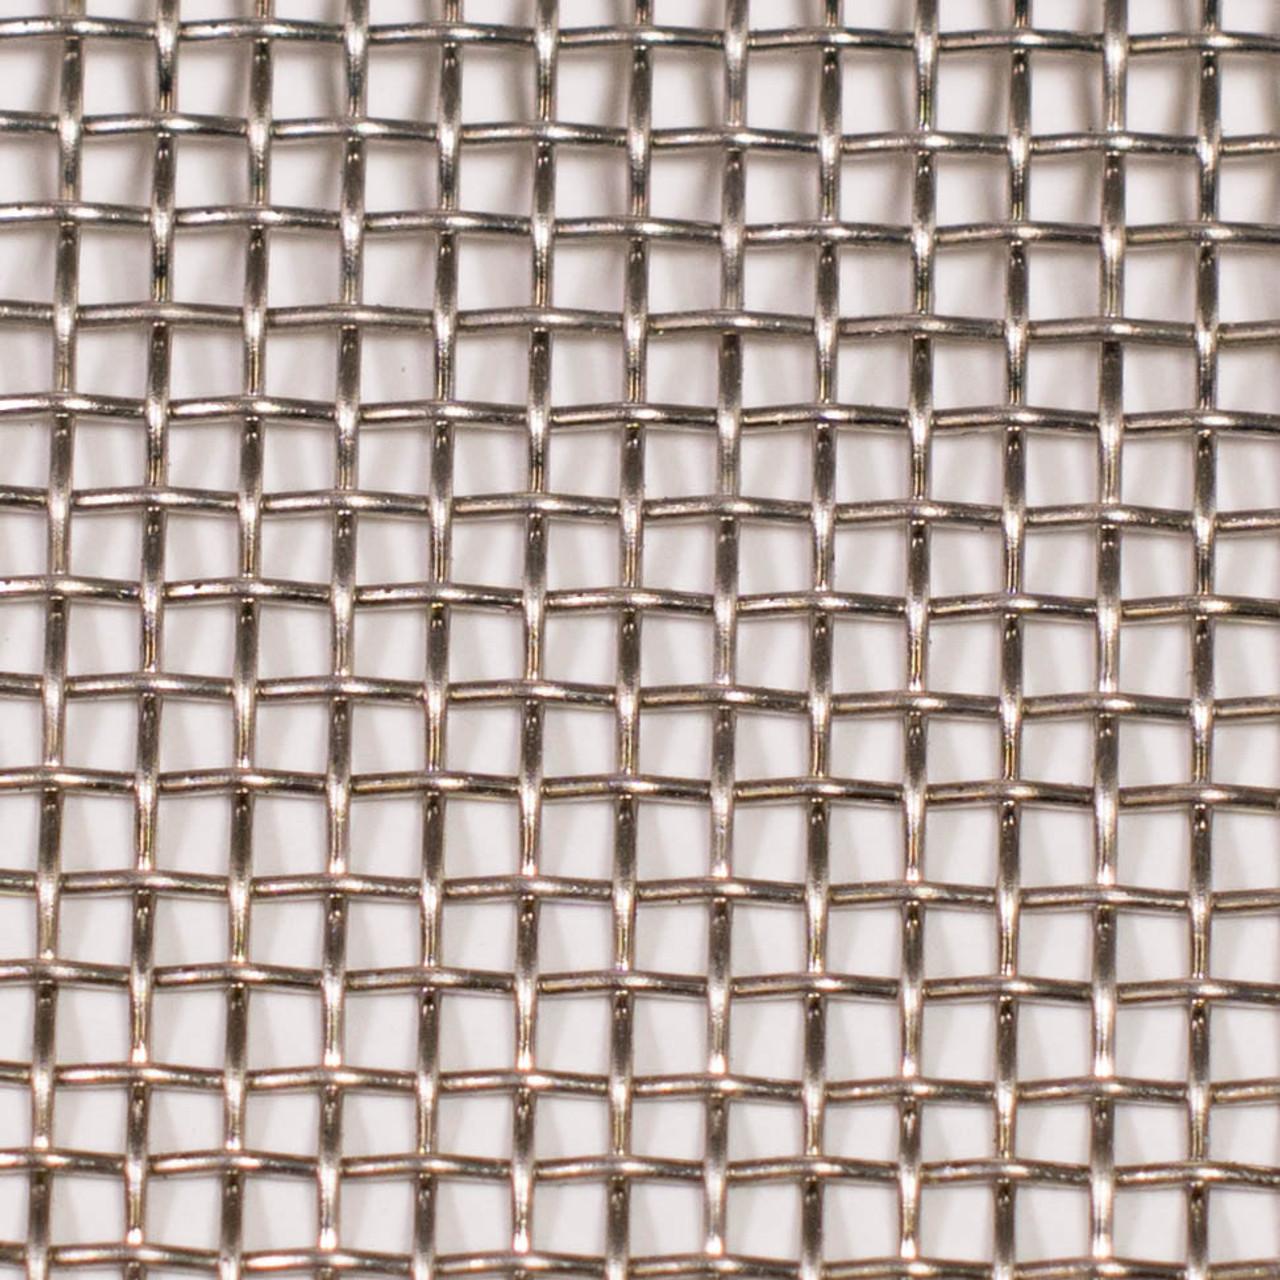 48 Inch x 100 Ft Stainless Steel 023 diameter